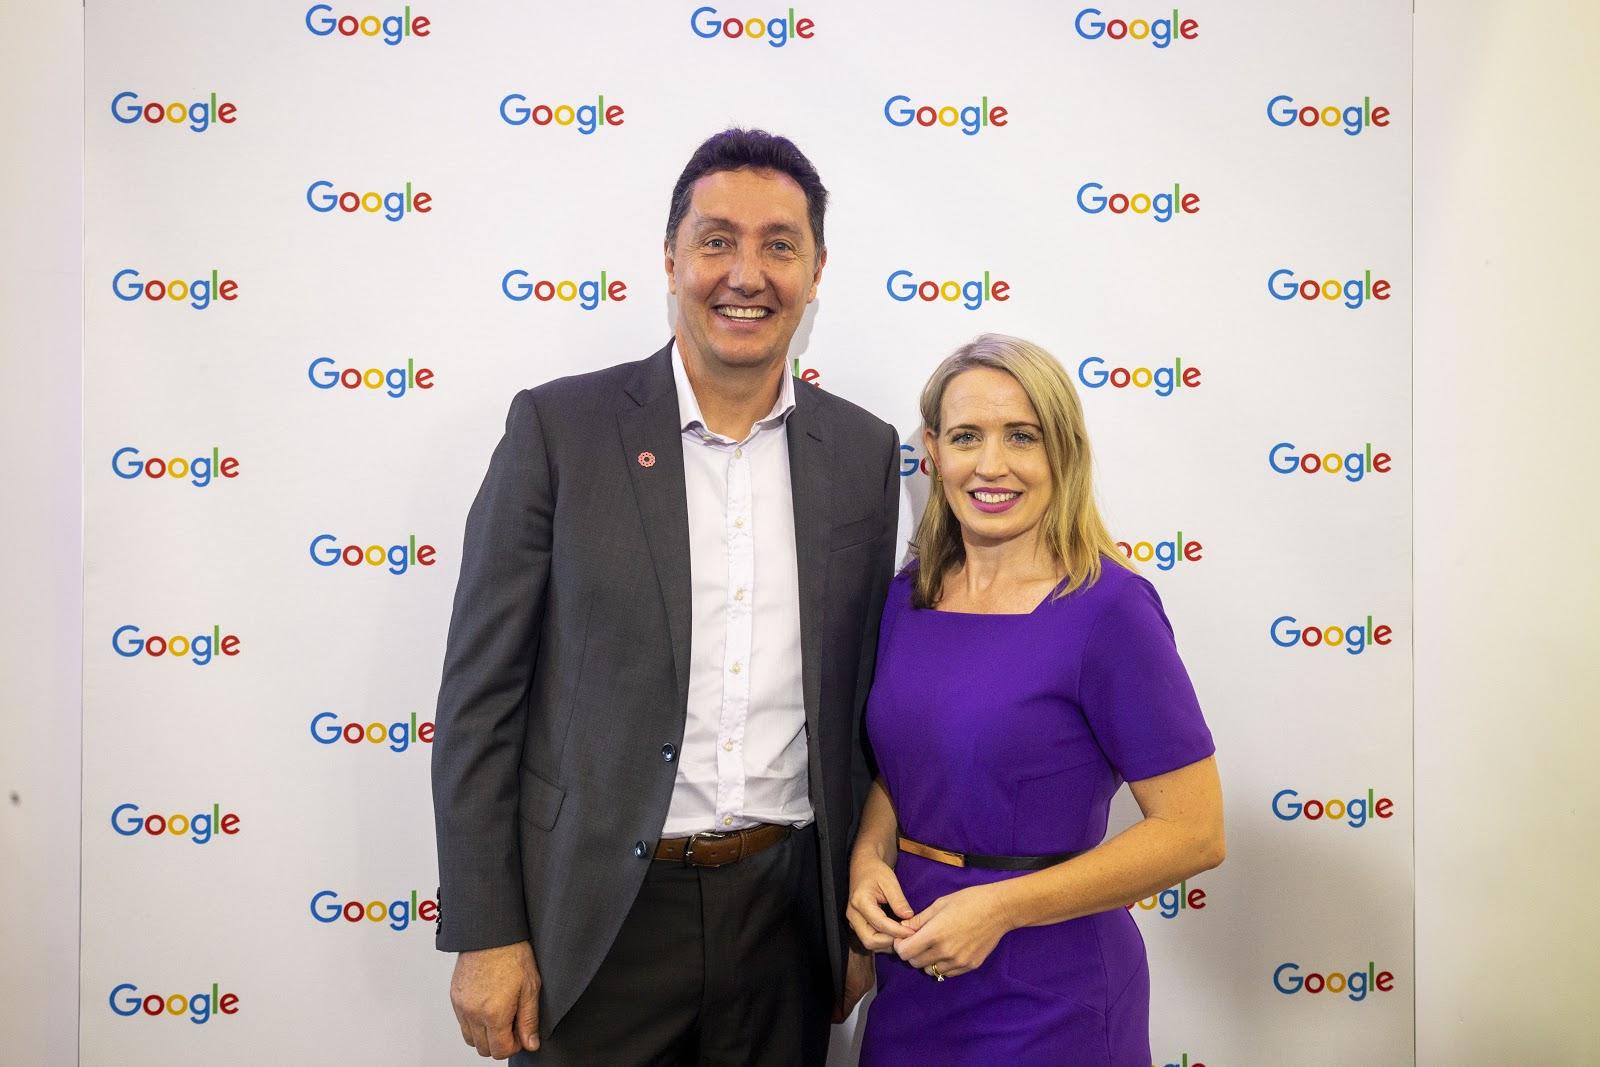 Photo of Google's John Ball with Minister, Kate Jones